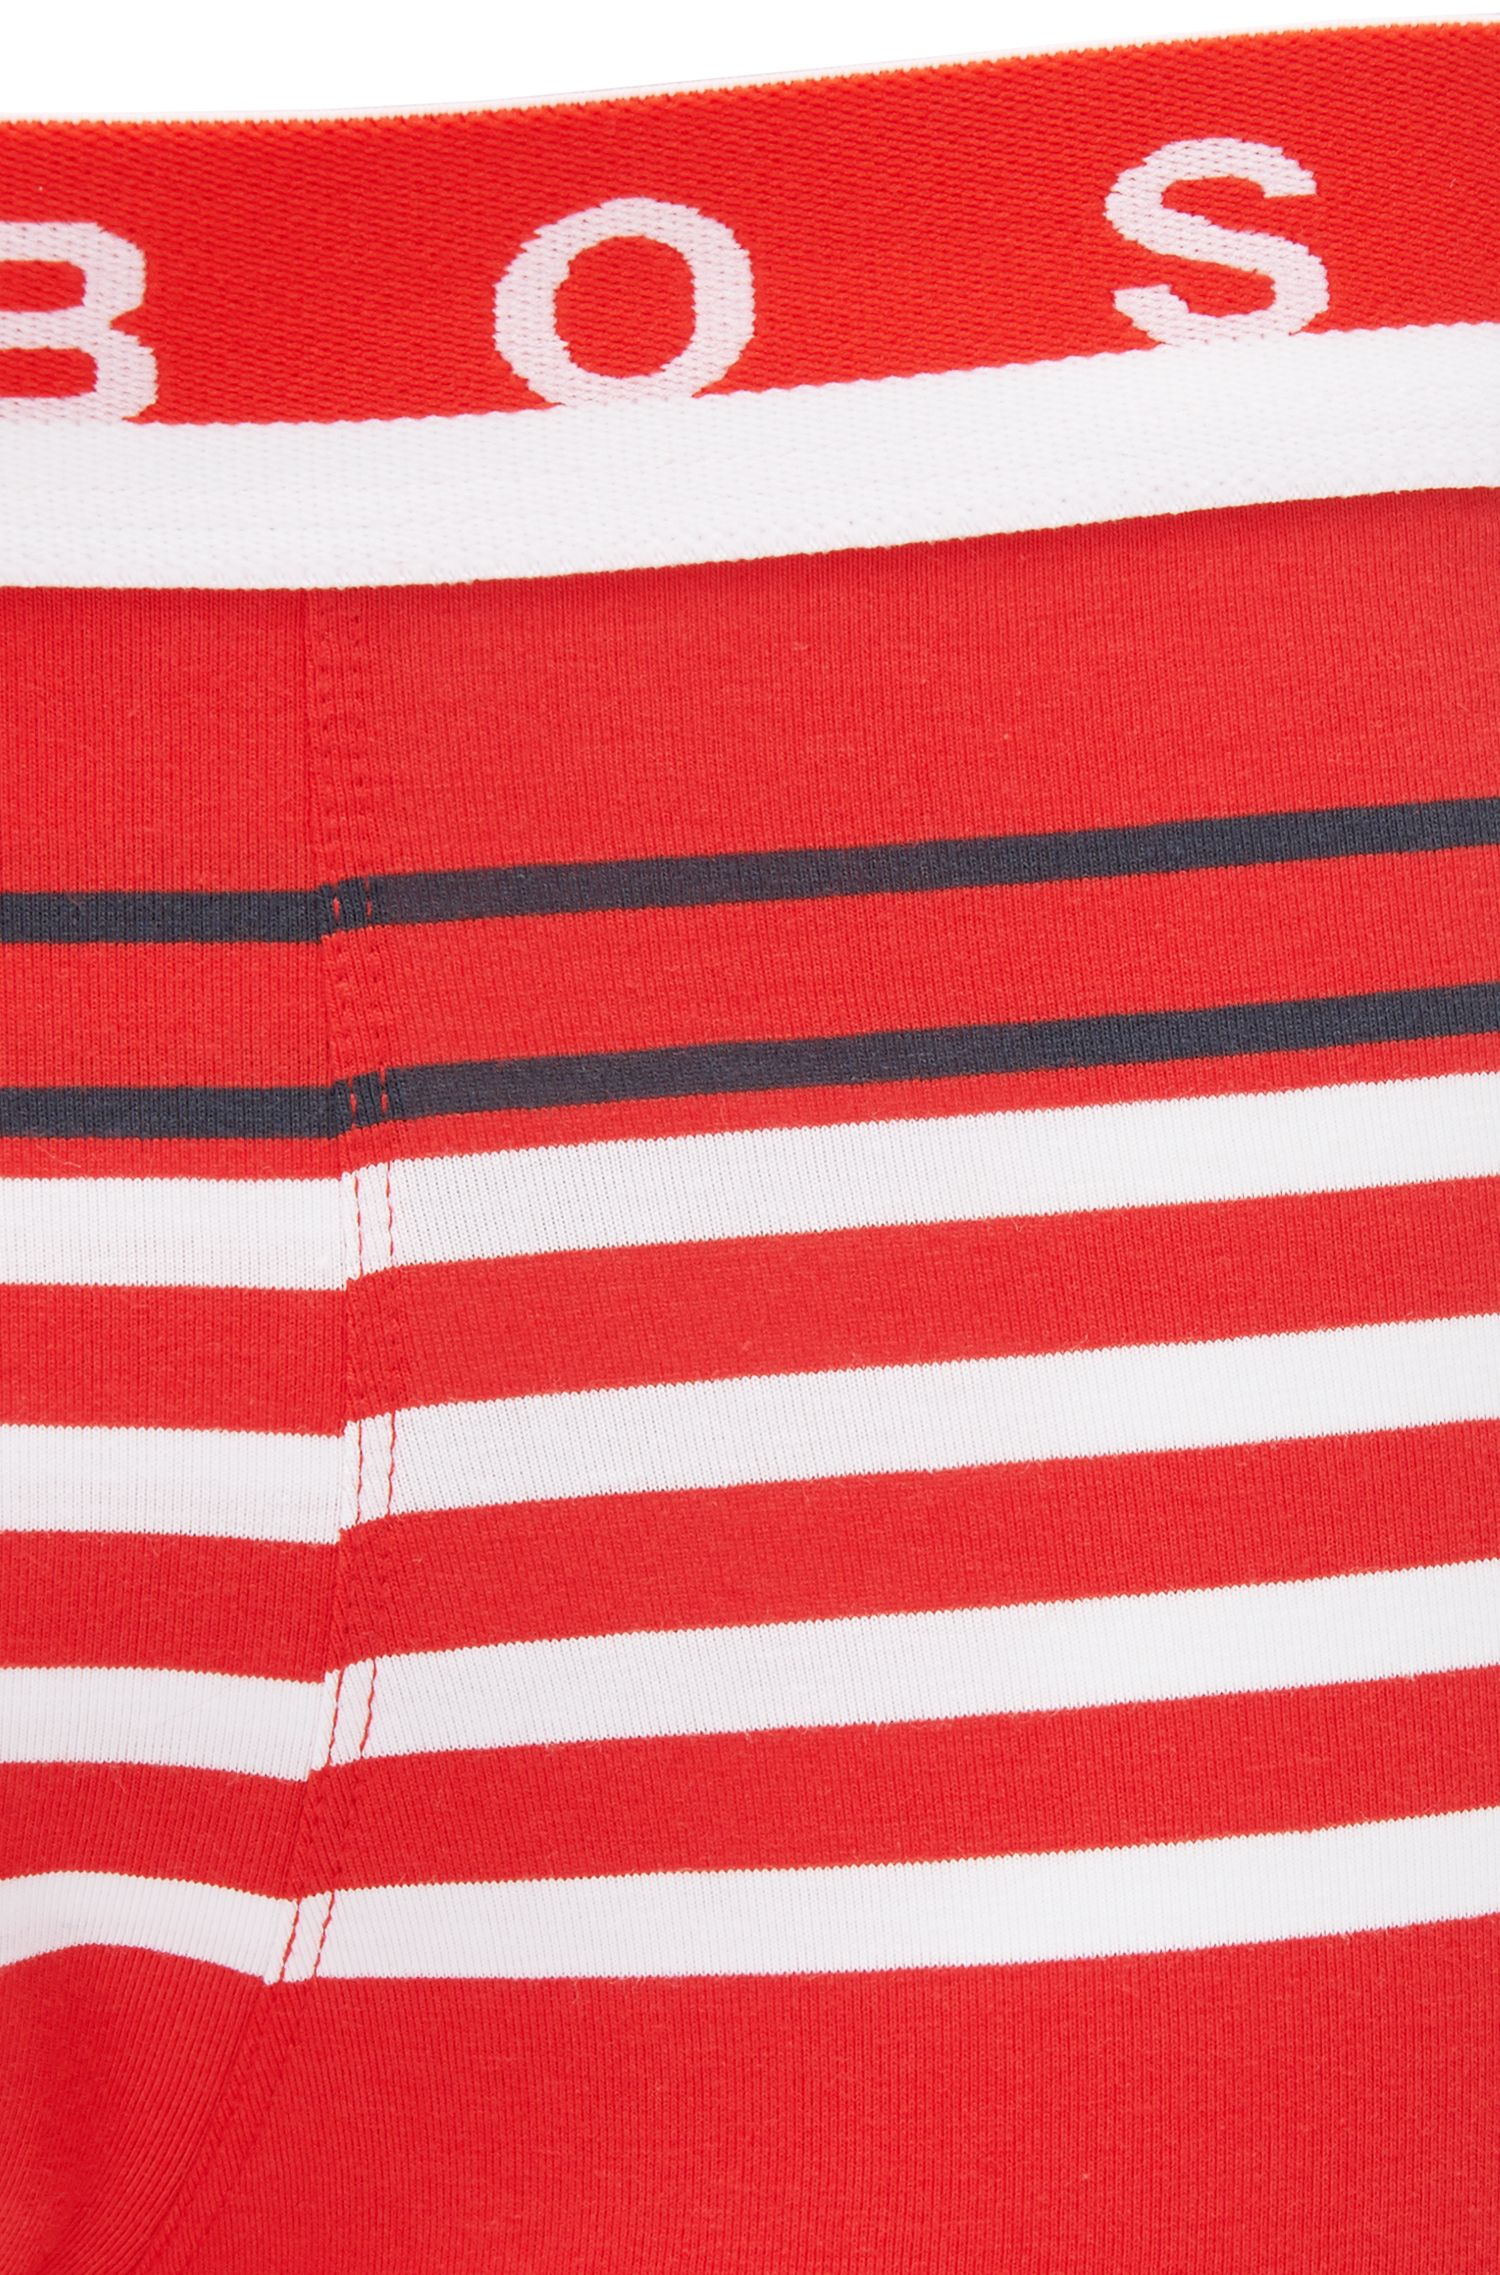 Striped Trunk | Trunk Multistripes, Red